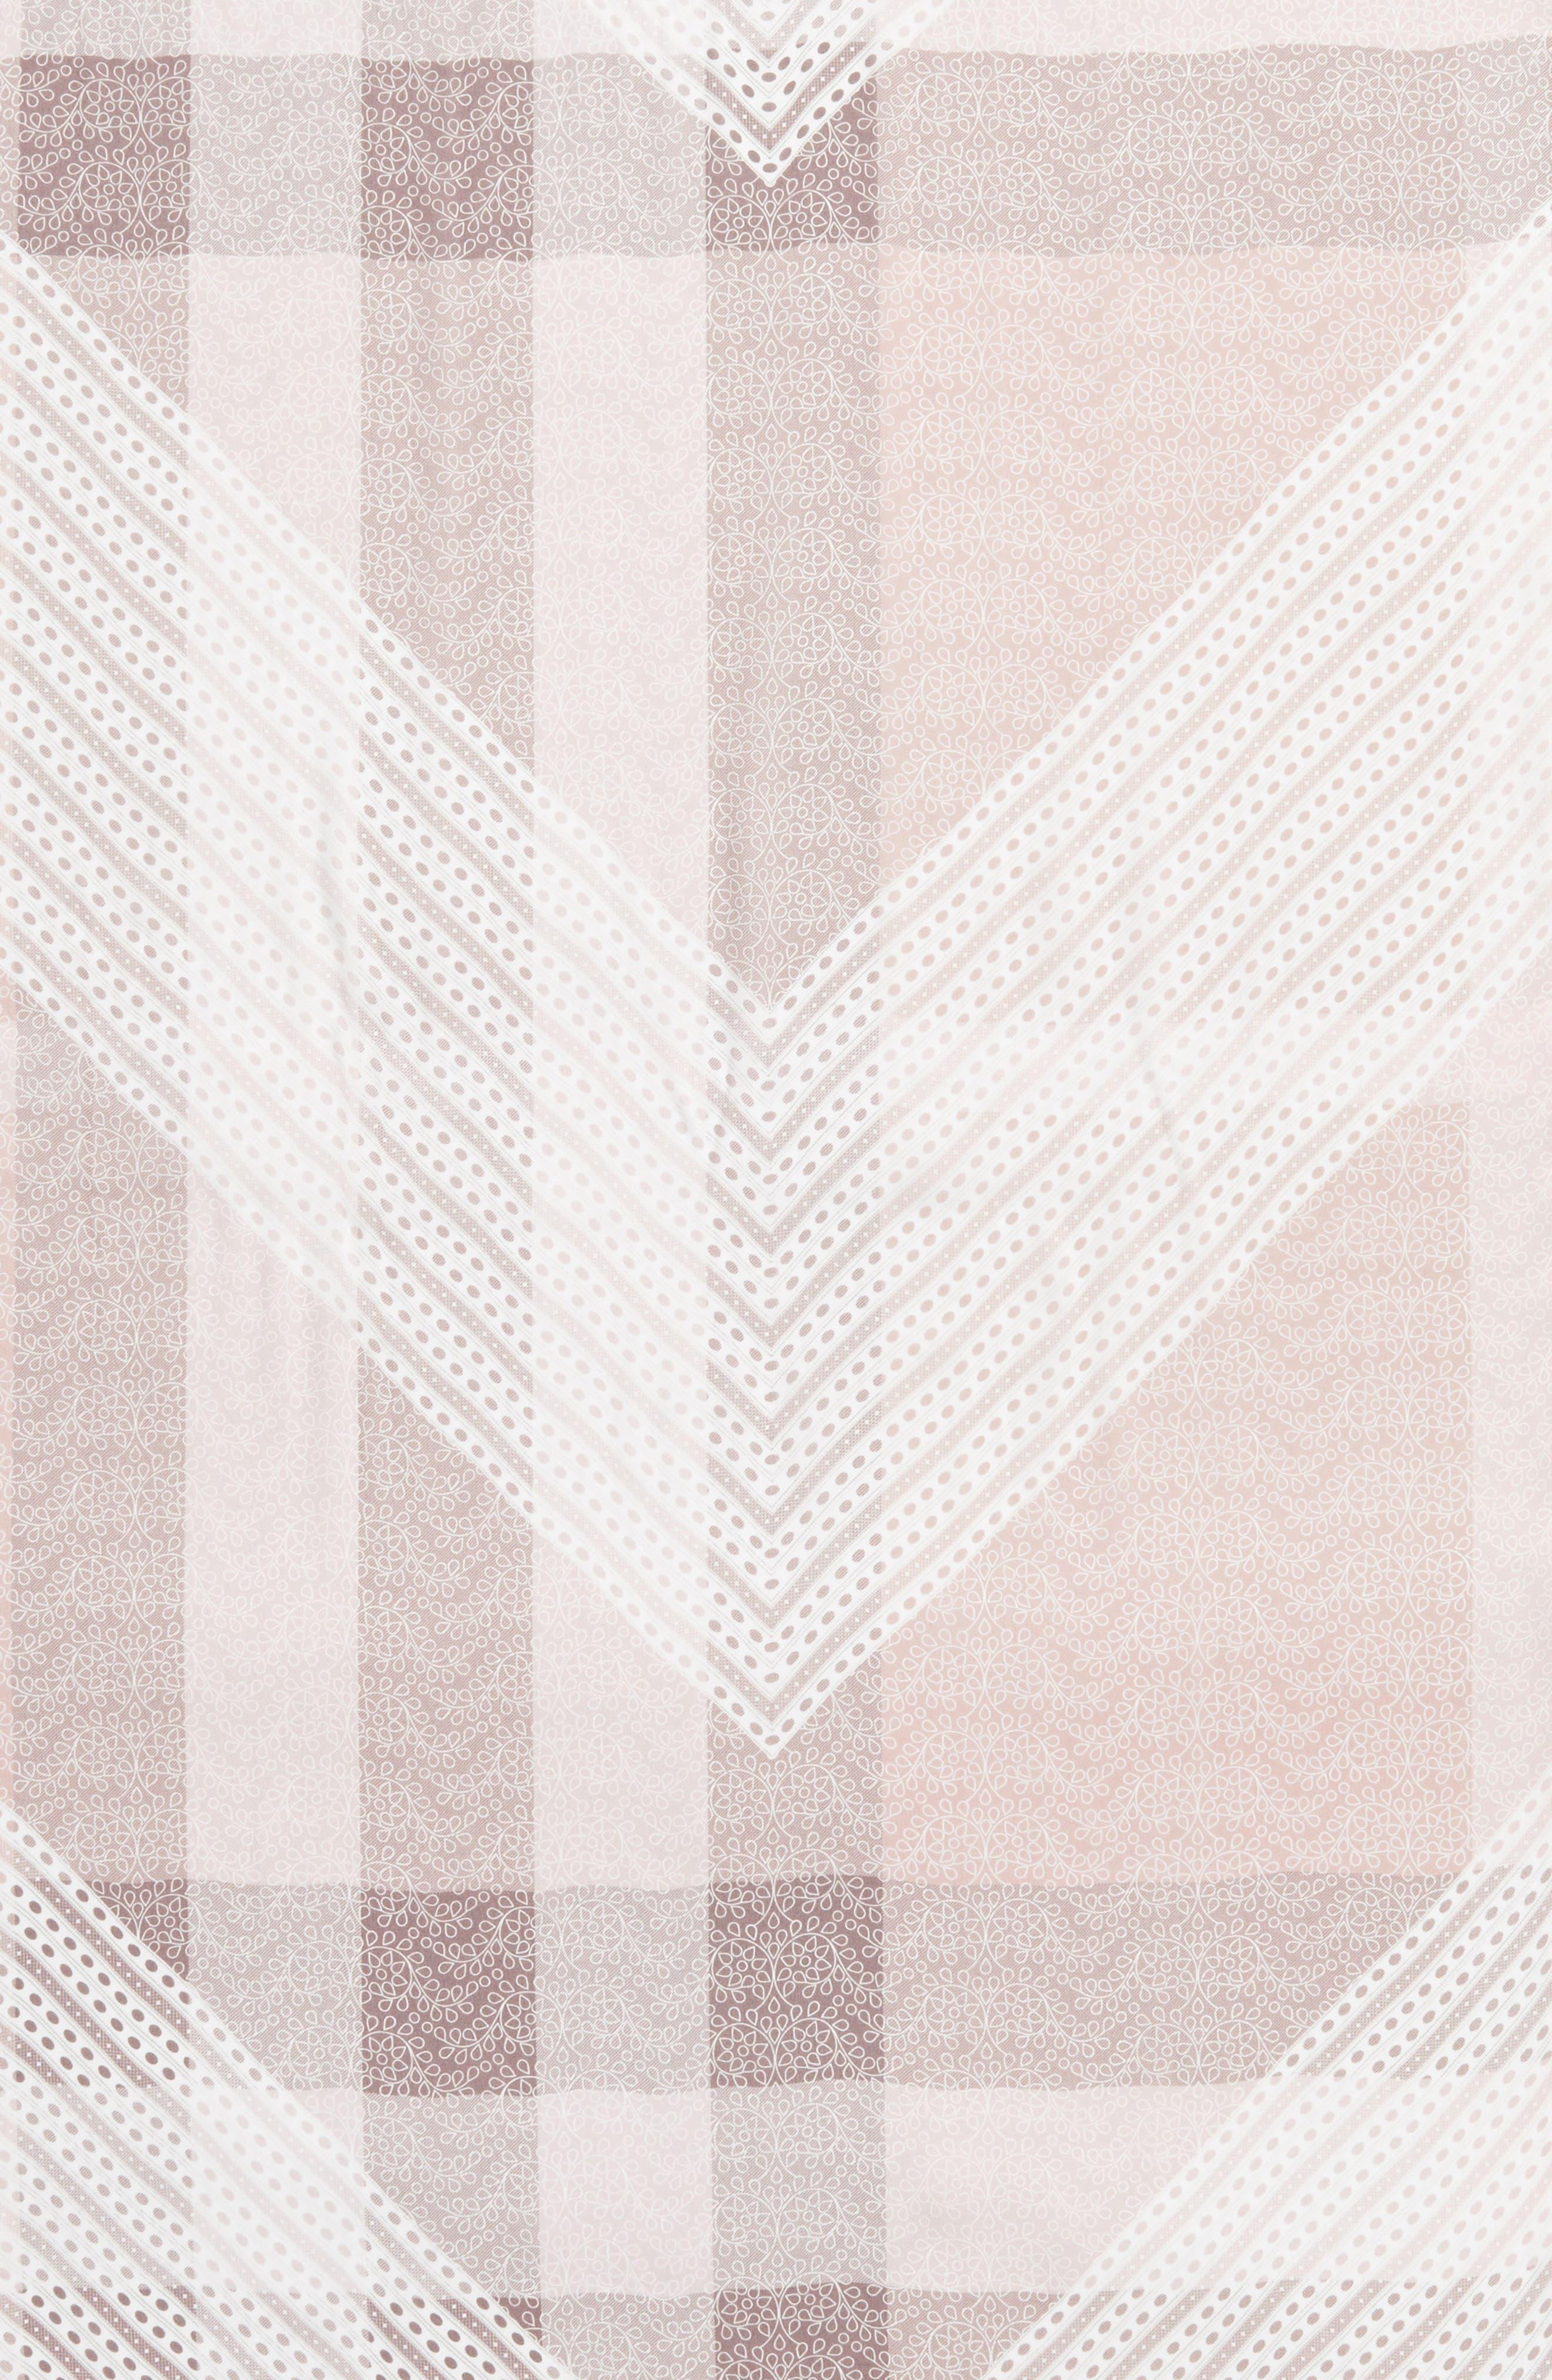 Ultra Mega Lace Silk Scarf,                             Alternate thumbnail 4, color,                             Ash Rose Pink